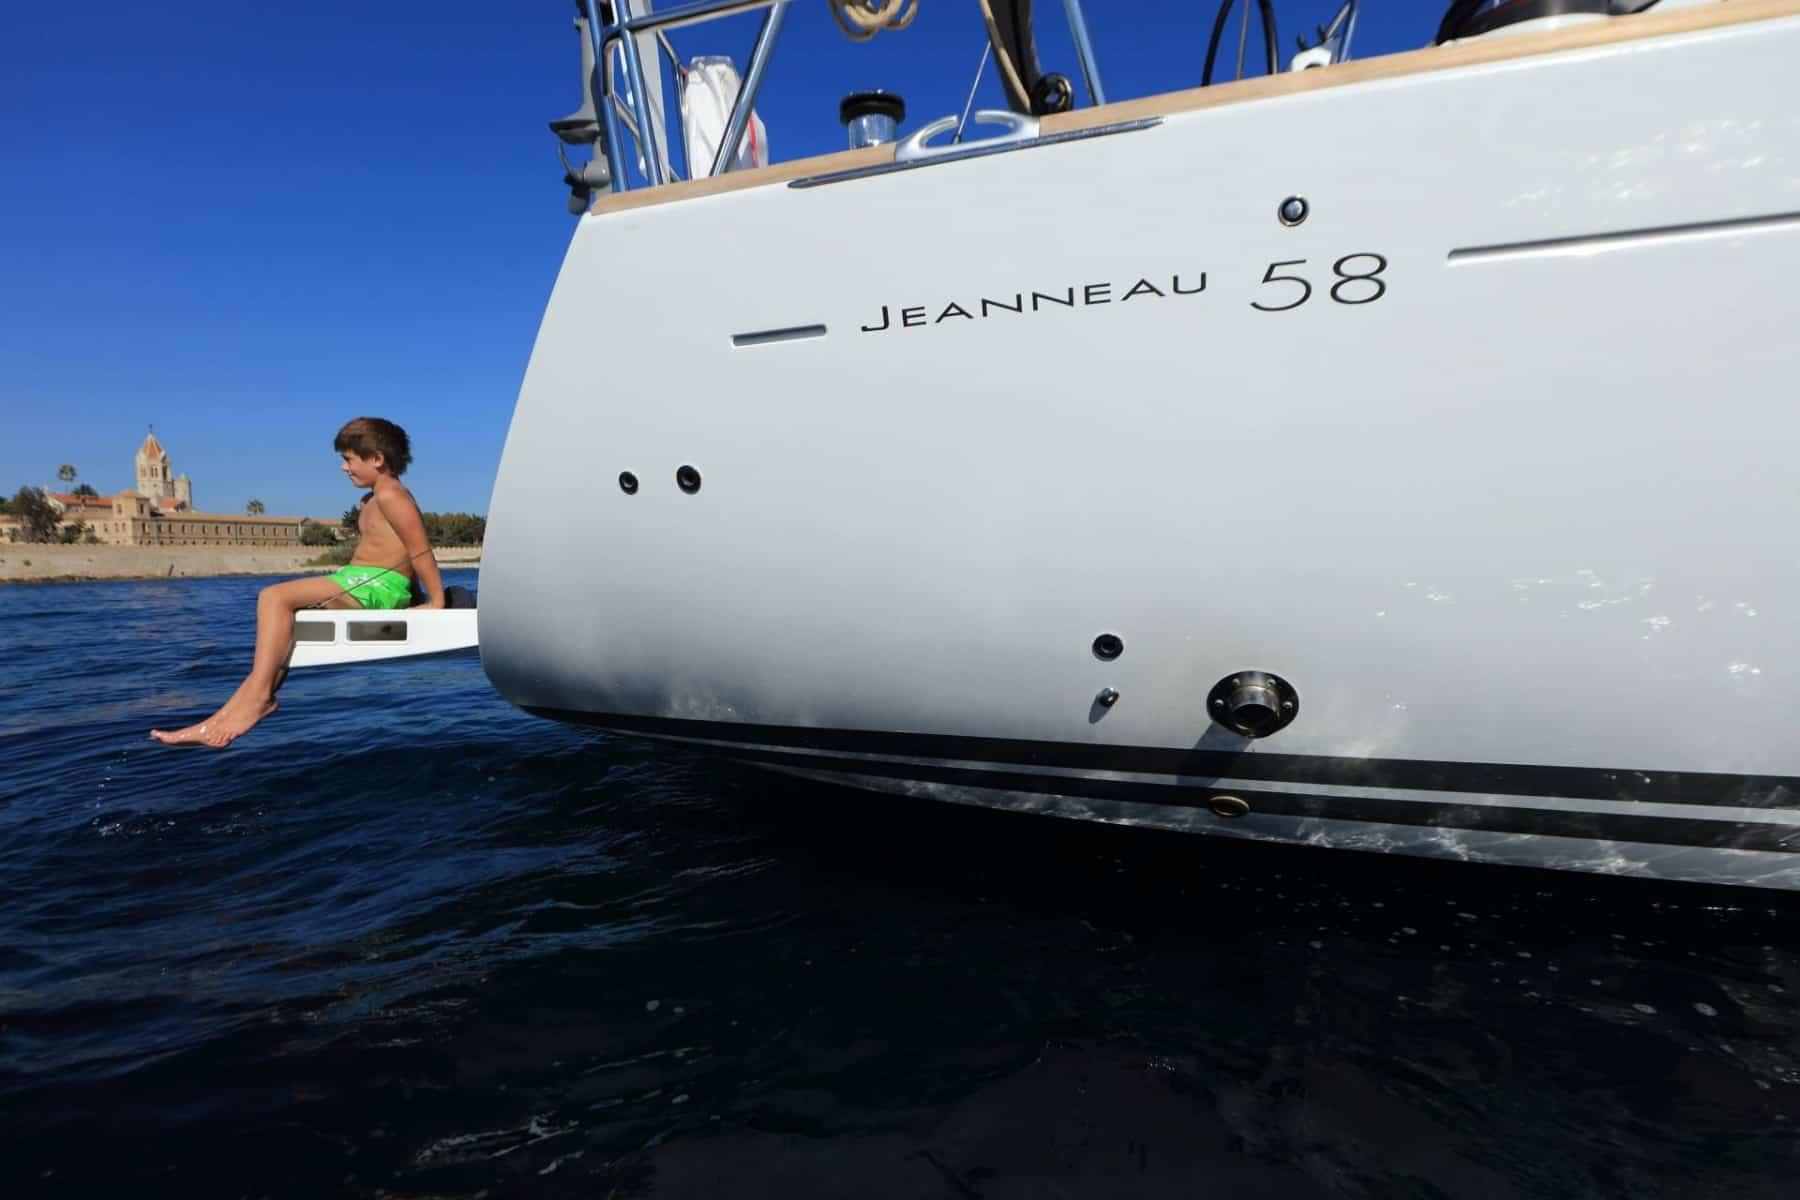 Jeanneau-58-exterior-6-charter-ownership-yacht